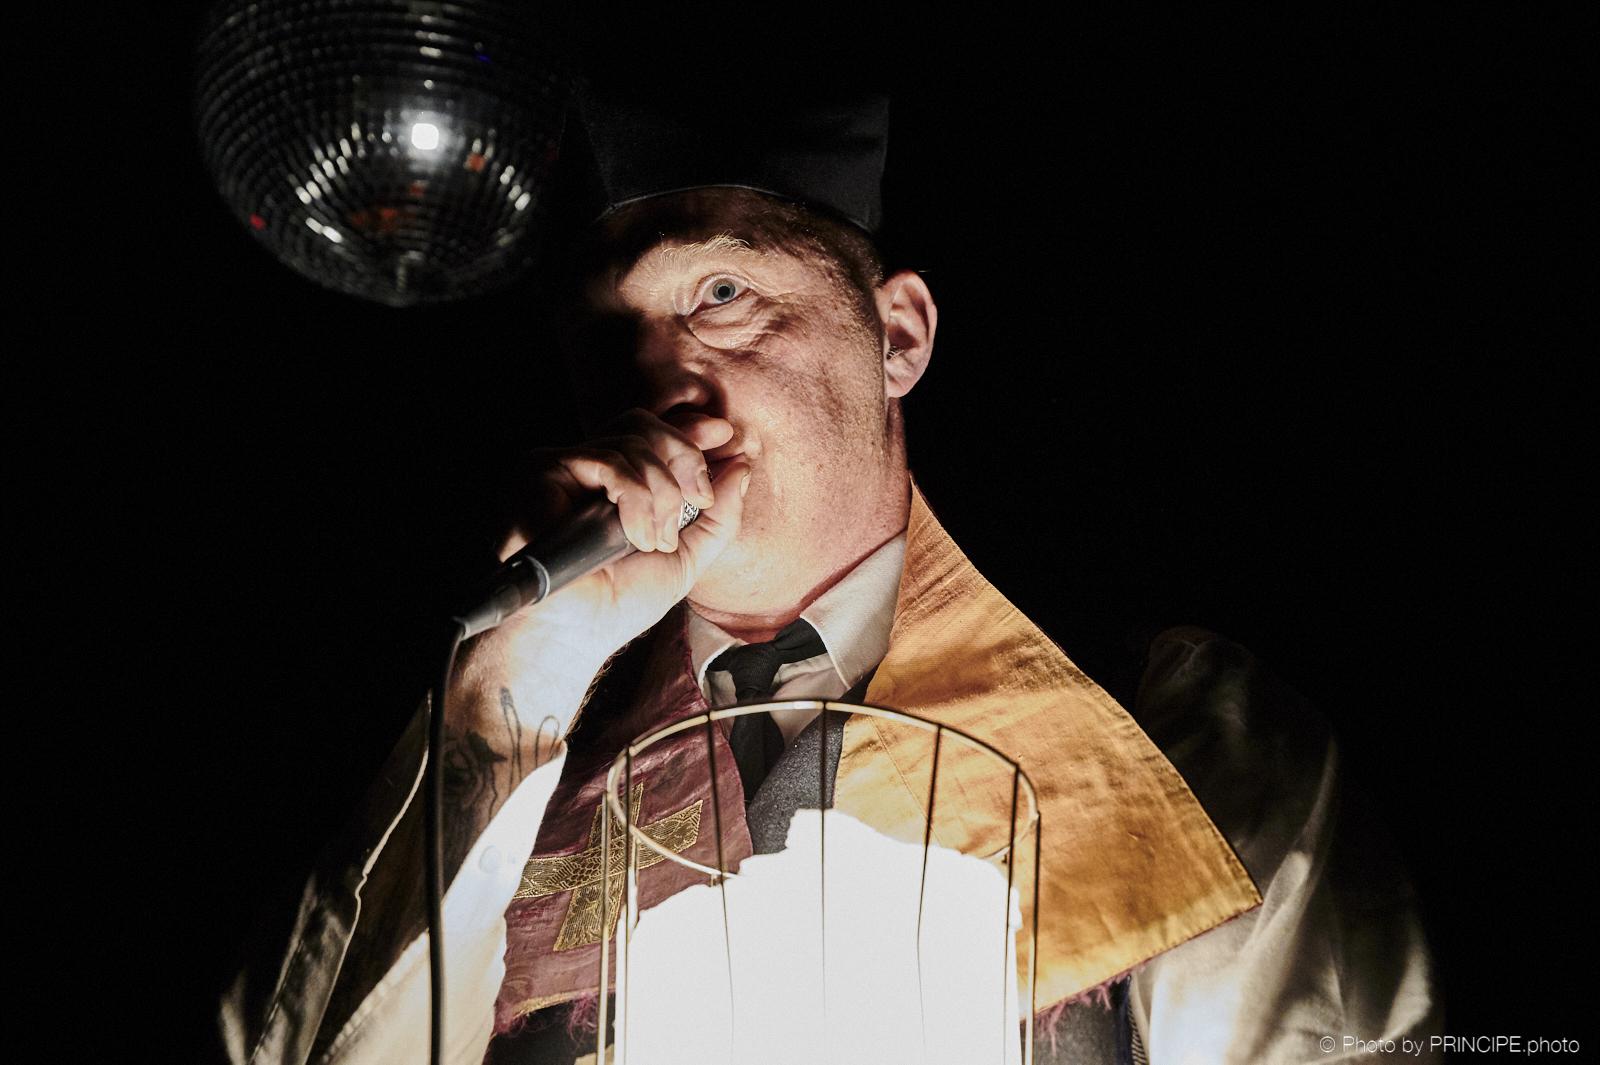 Reverend Beat-Man @ Bad Bonn